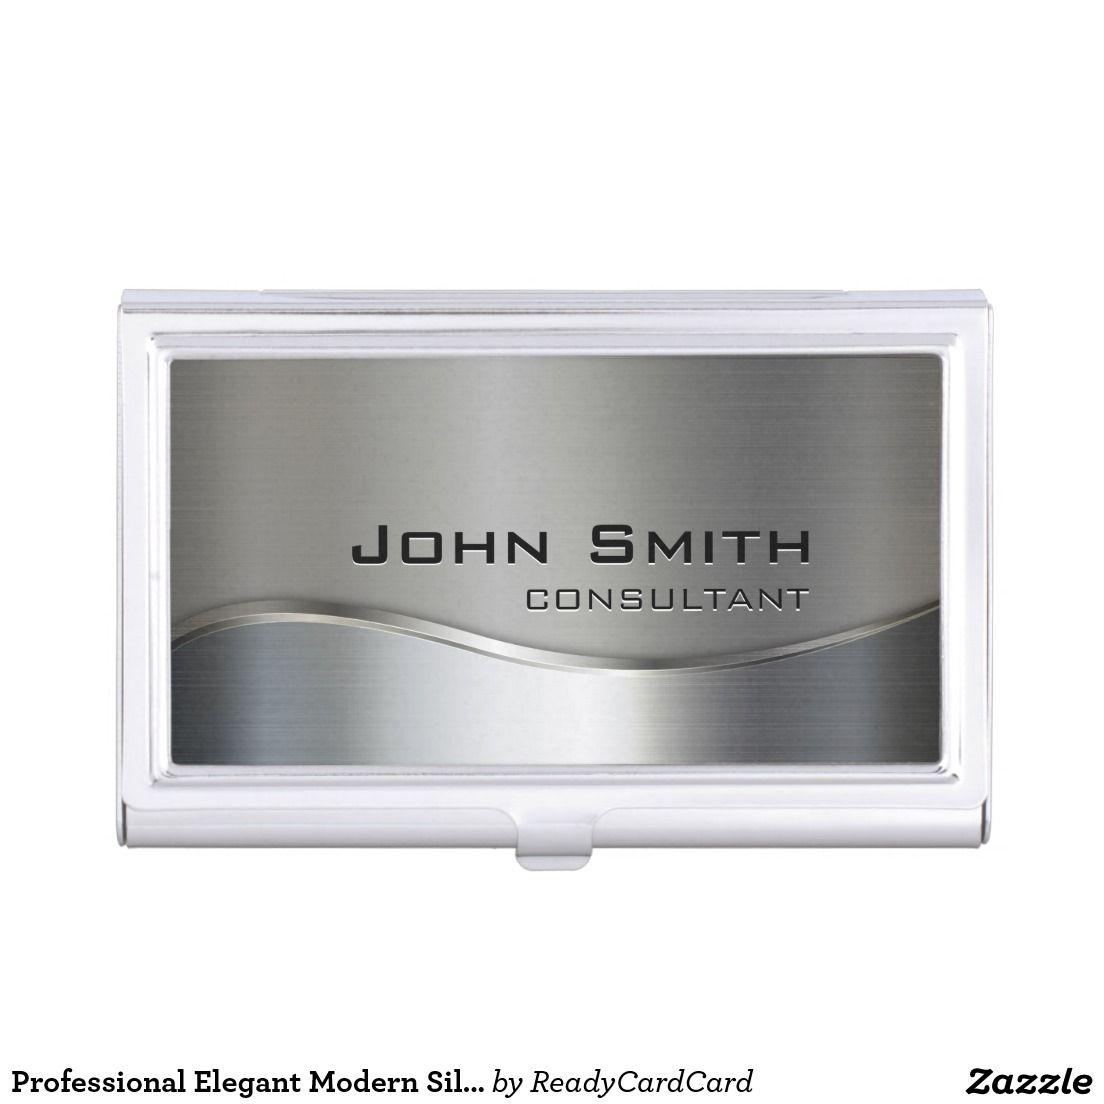 Professional Elegant Modern Silver & Gold Metal Bu Business Card ...